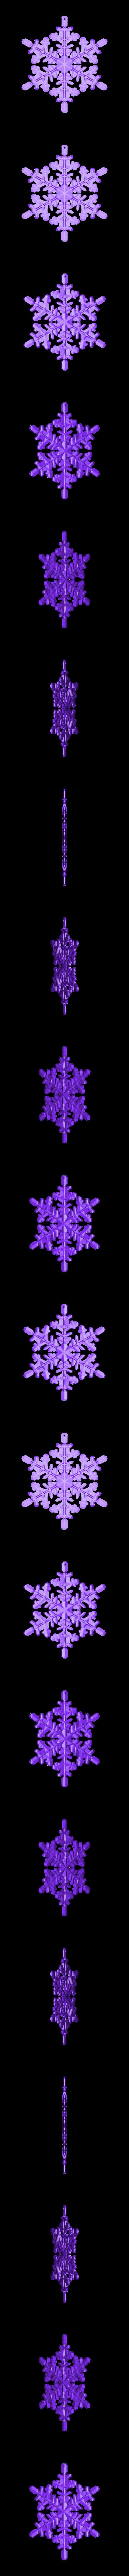 CreativeTools.se_-_ZPrinter-model_-_Snowflake.stl Download free STL file Snowflake • 3D printable object, CreativeTools